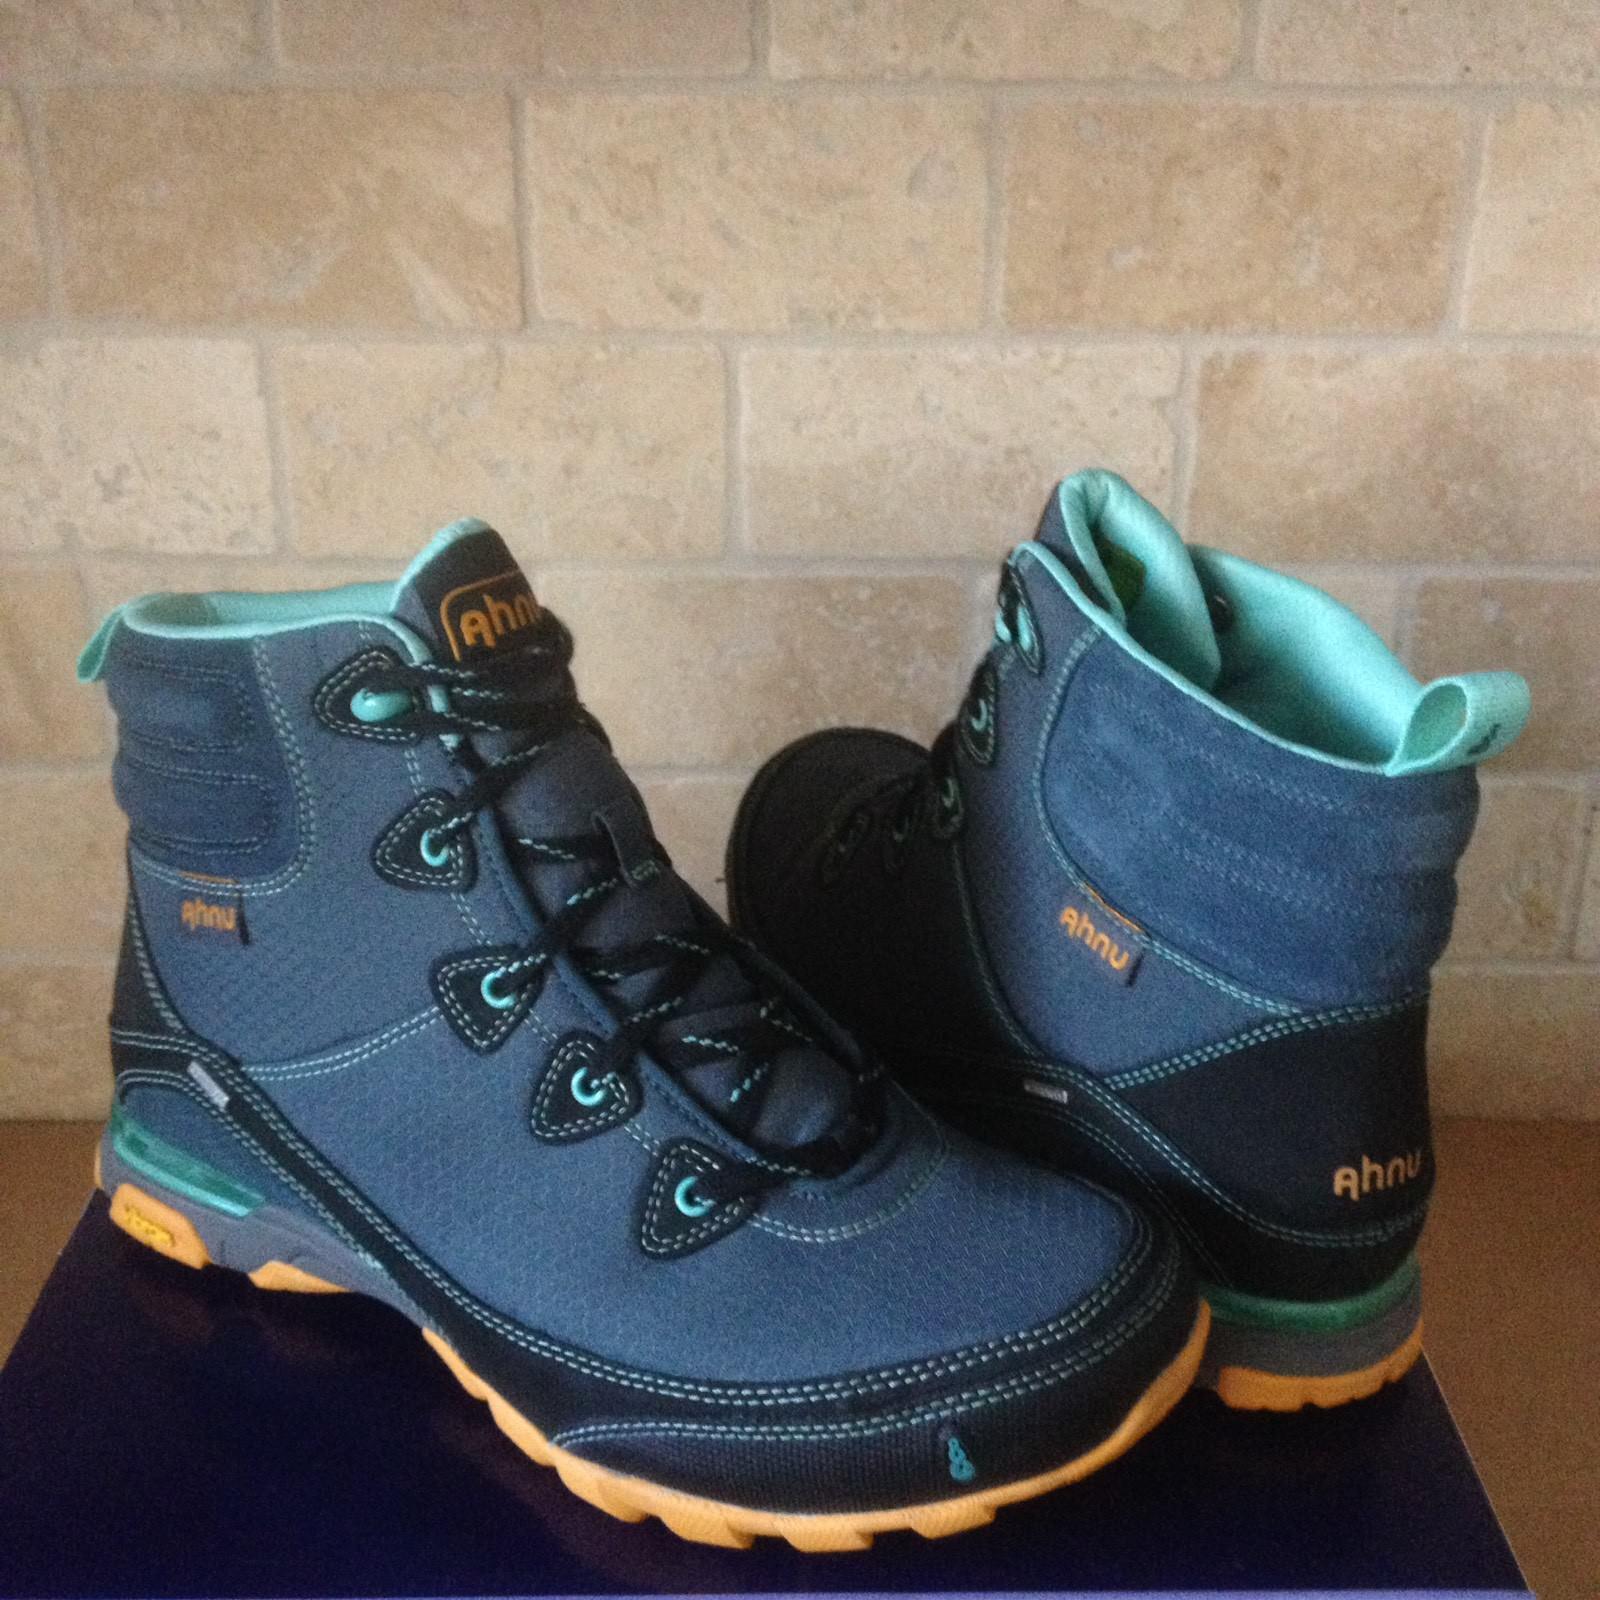 AHNU Sugarpine Schuhes Dark Slate Waterproof Hiking Trail Stiefel Schuhes Sugarpine Größe 5.5 Damenschuhe 5522d1